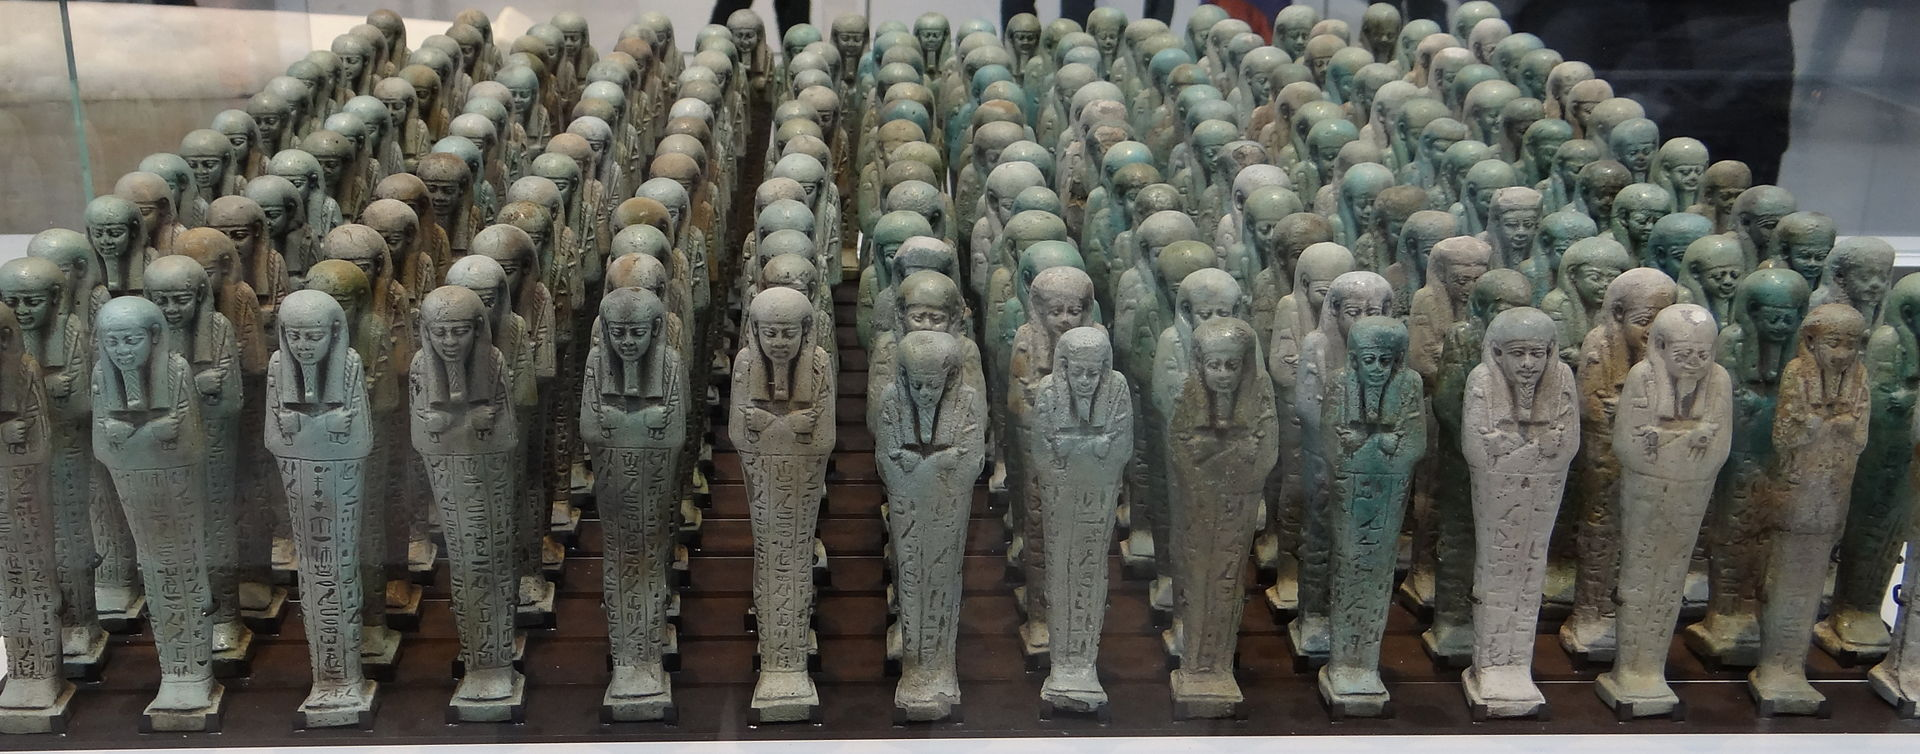 Ushebti 1920px-Menphis_-_Egypte_-_500before_JC_-_Troop_of_funerary_servant_figures_shabtis_in_the_name_of_Neferibreheb